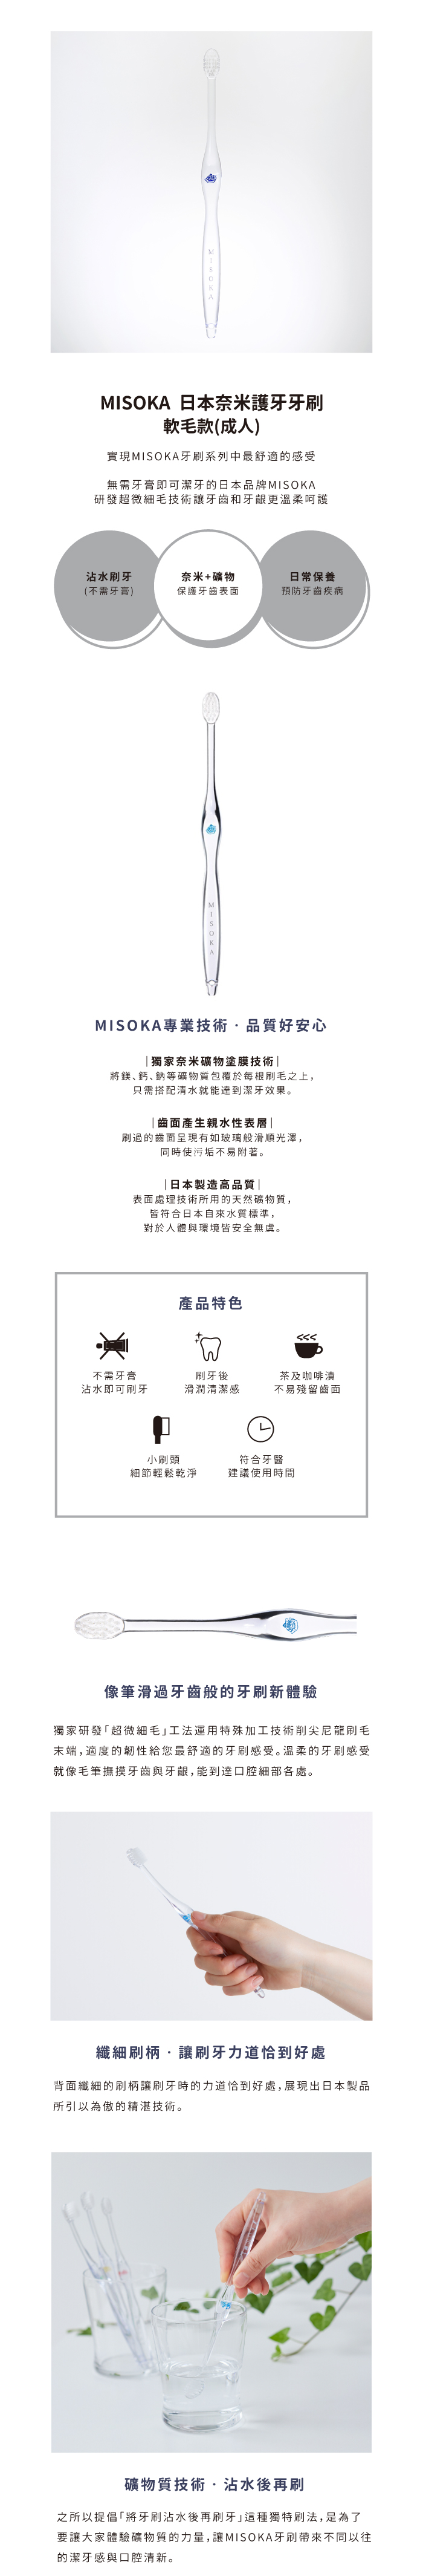 MISOKA │  COMFORT 軟毛款頂級免沾牙膏牙刷 (日本製 / 山吹色 / 成人)